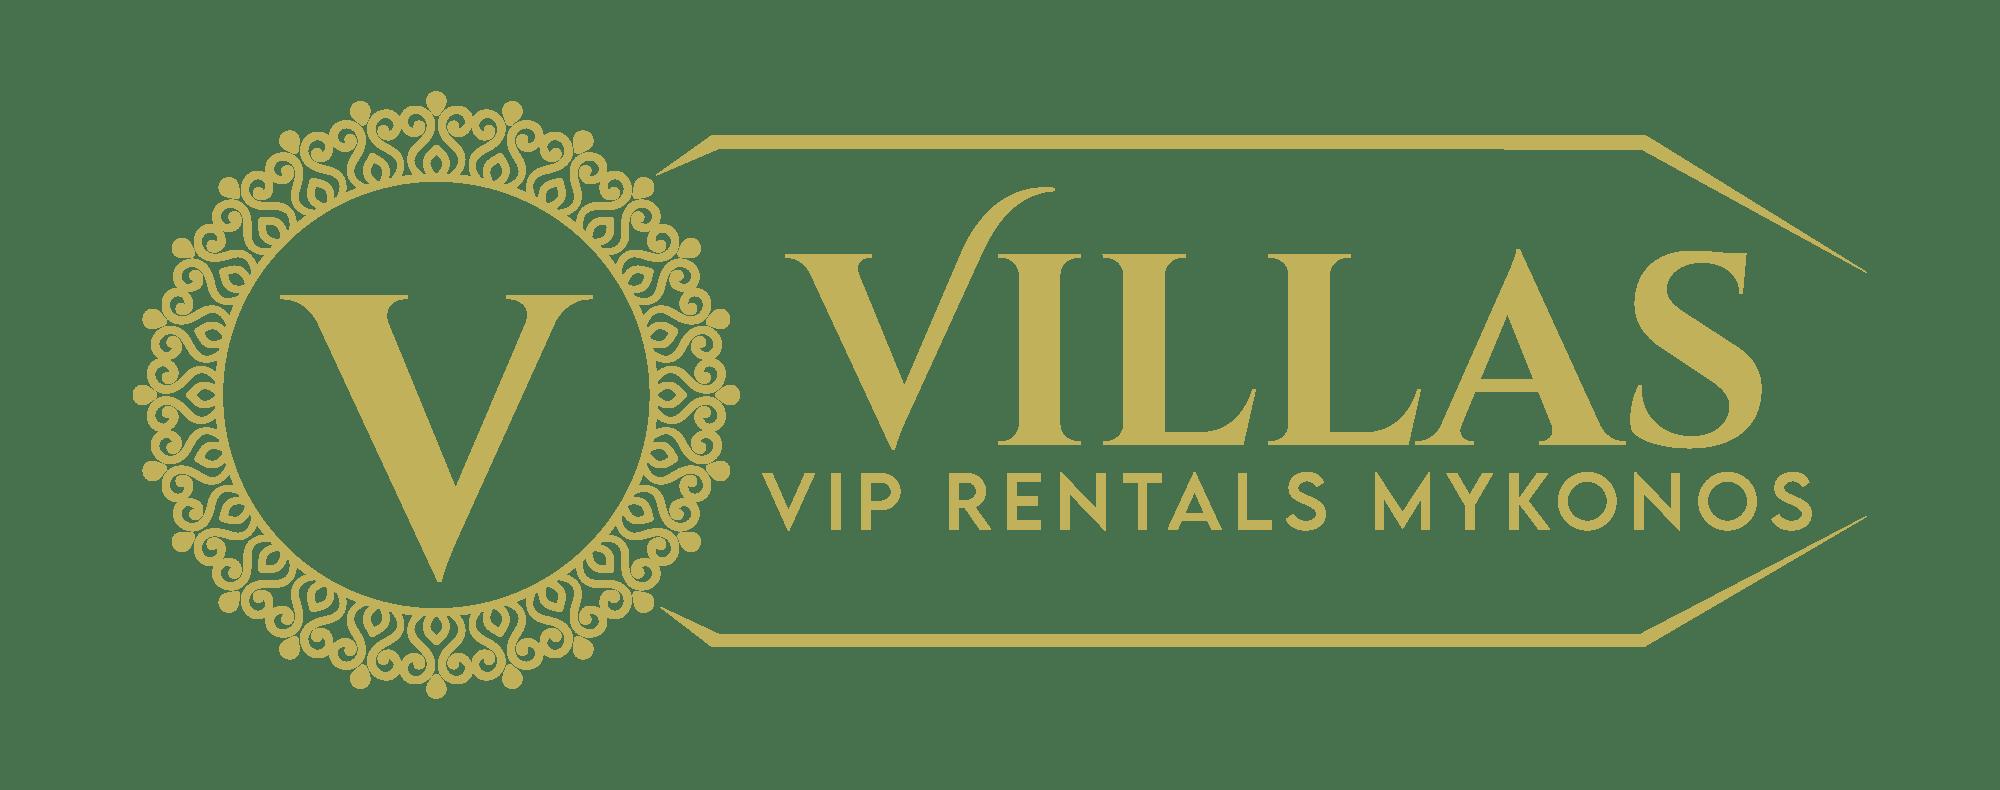 Villas Mykonos Rent - logo - villas in Mykonos